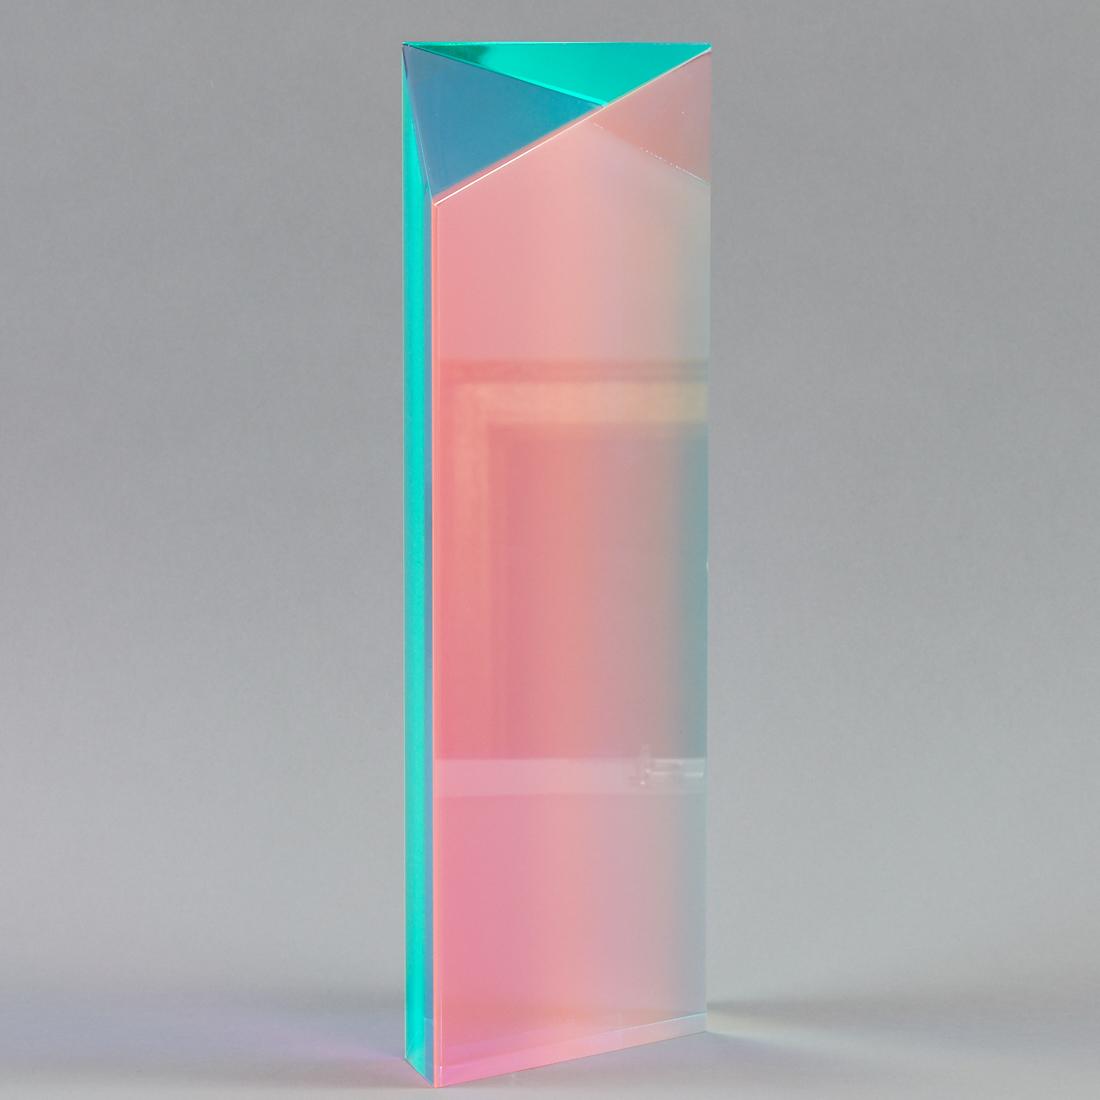 Lot 87 - Velizar Mihich VASA Acrylic Pillar Sculpture